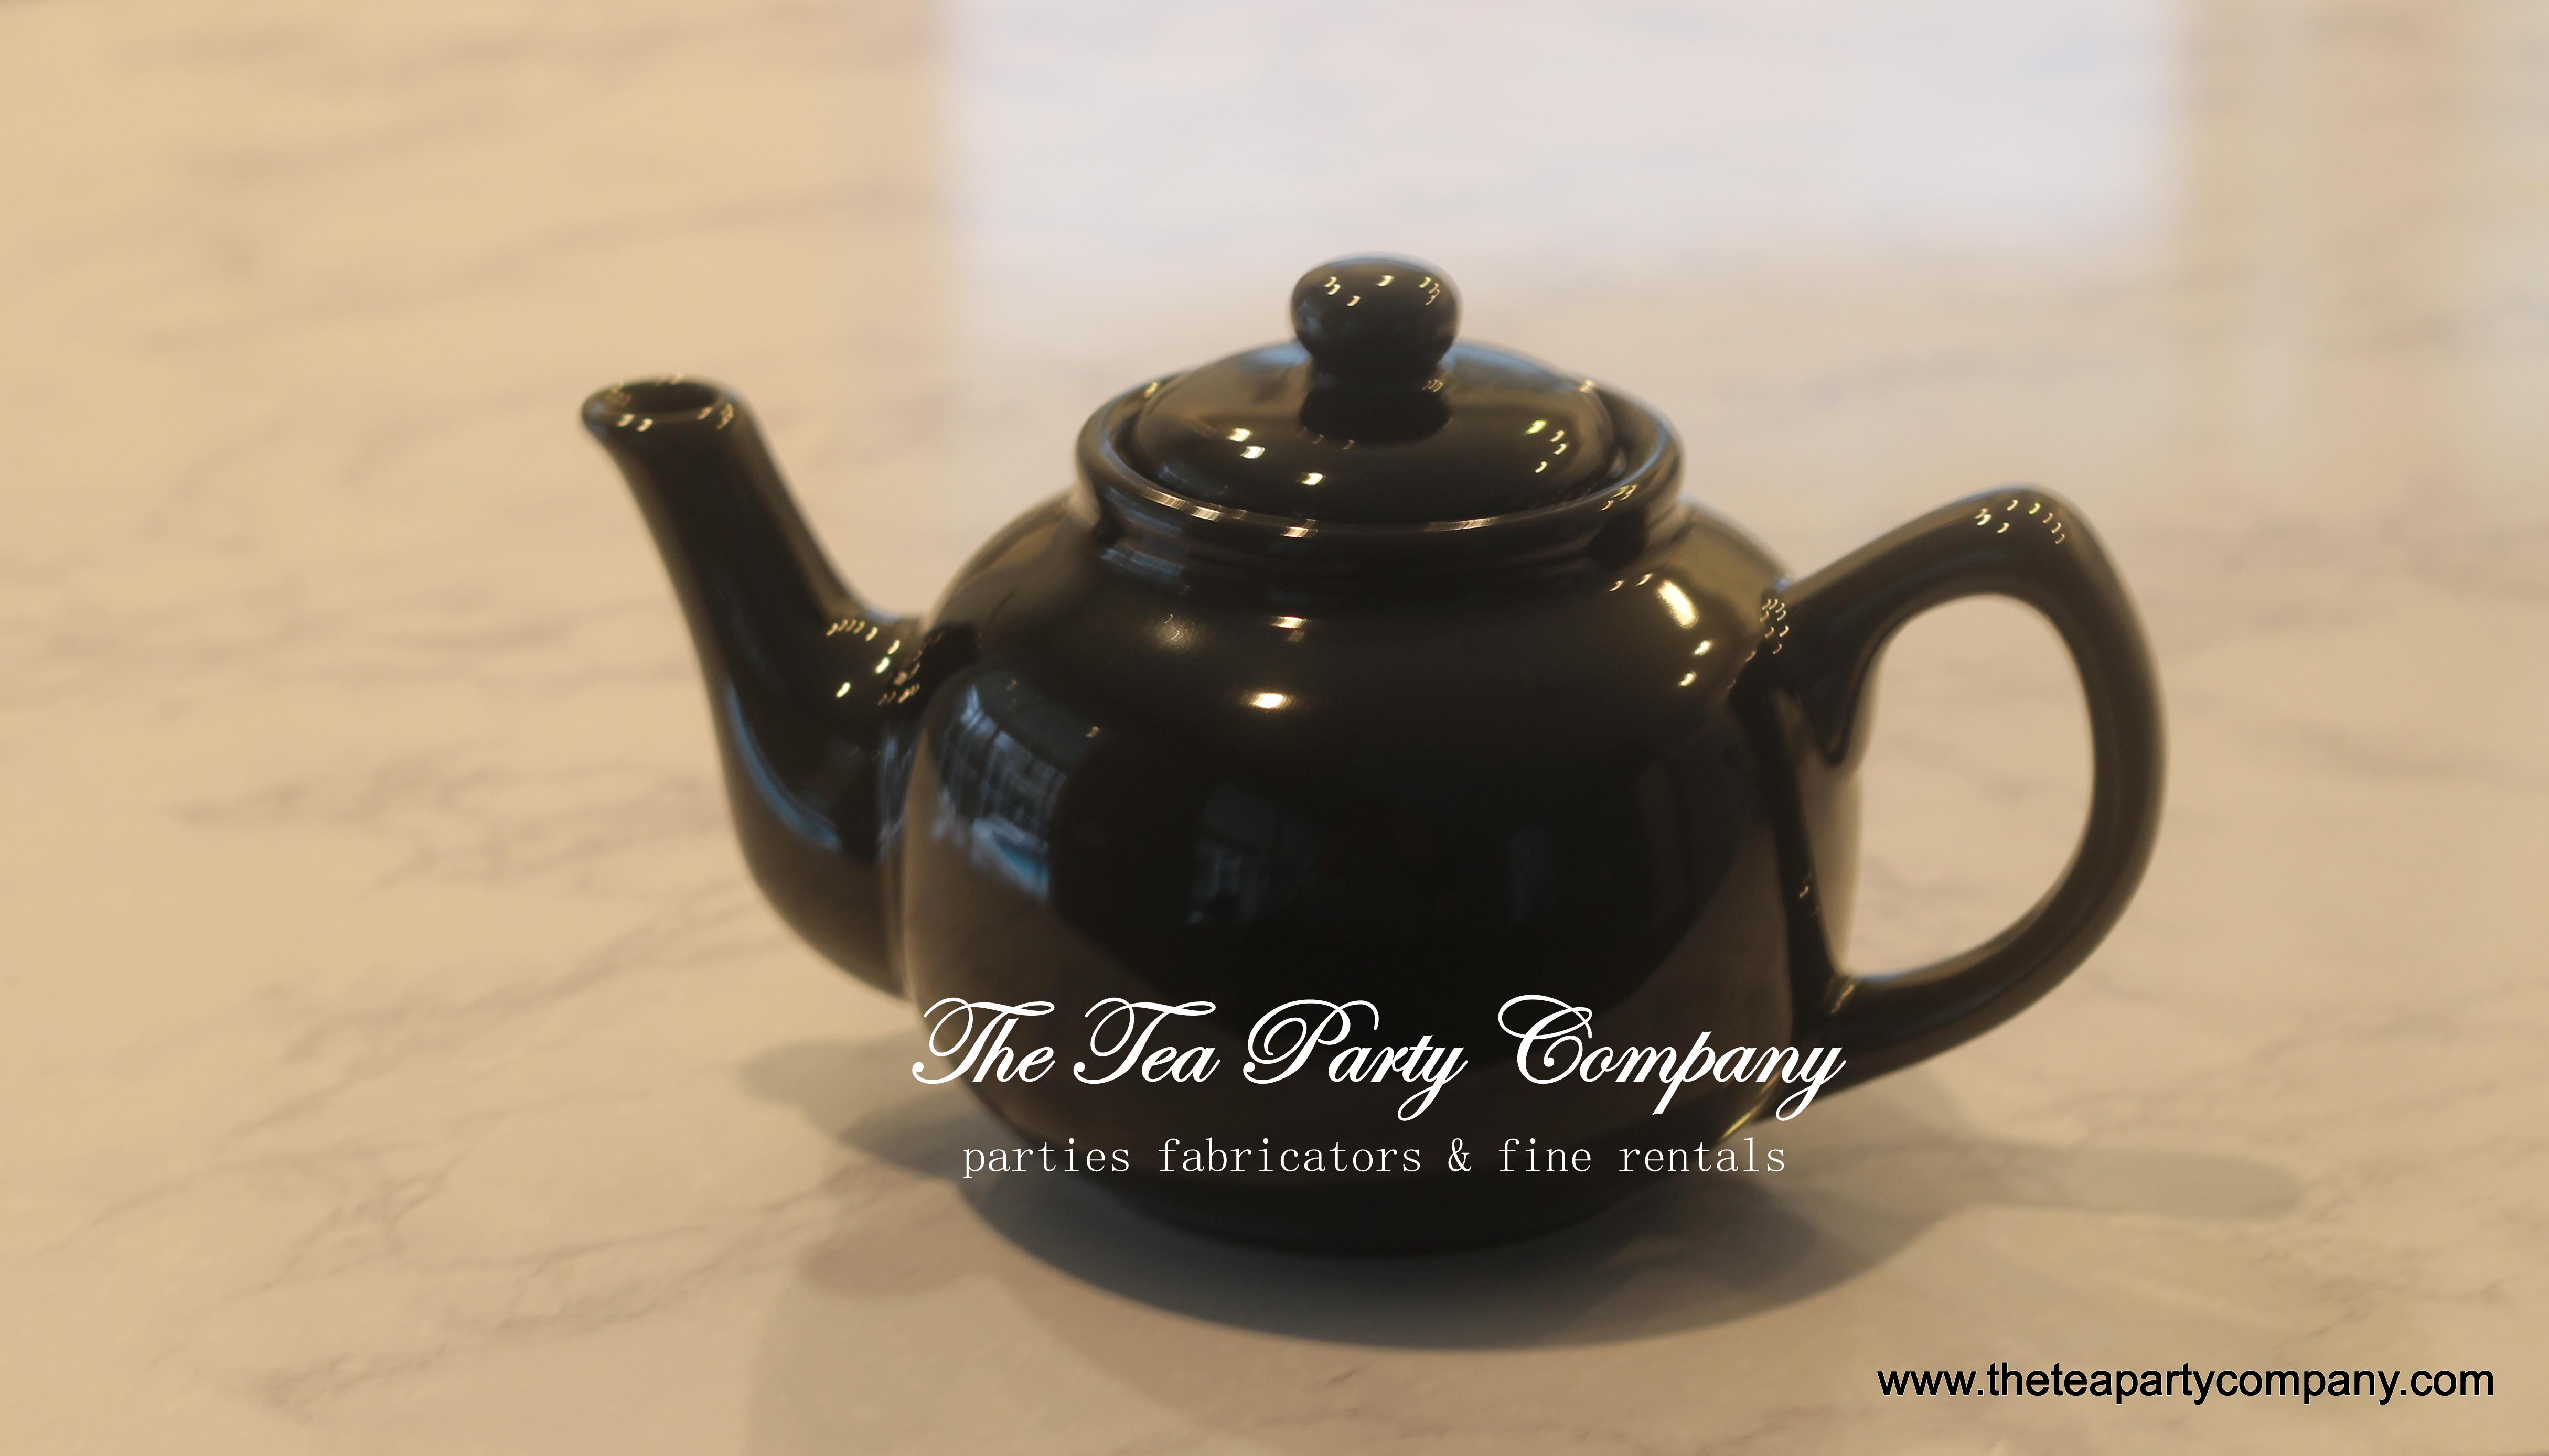 Mismatch Tea Pots The Tea Party Company (8)